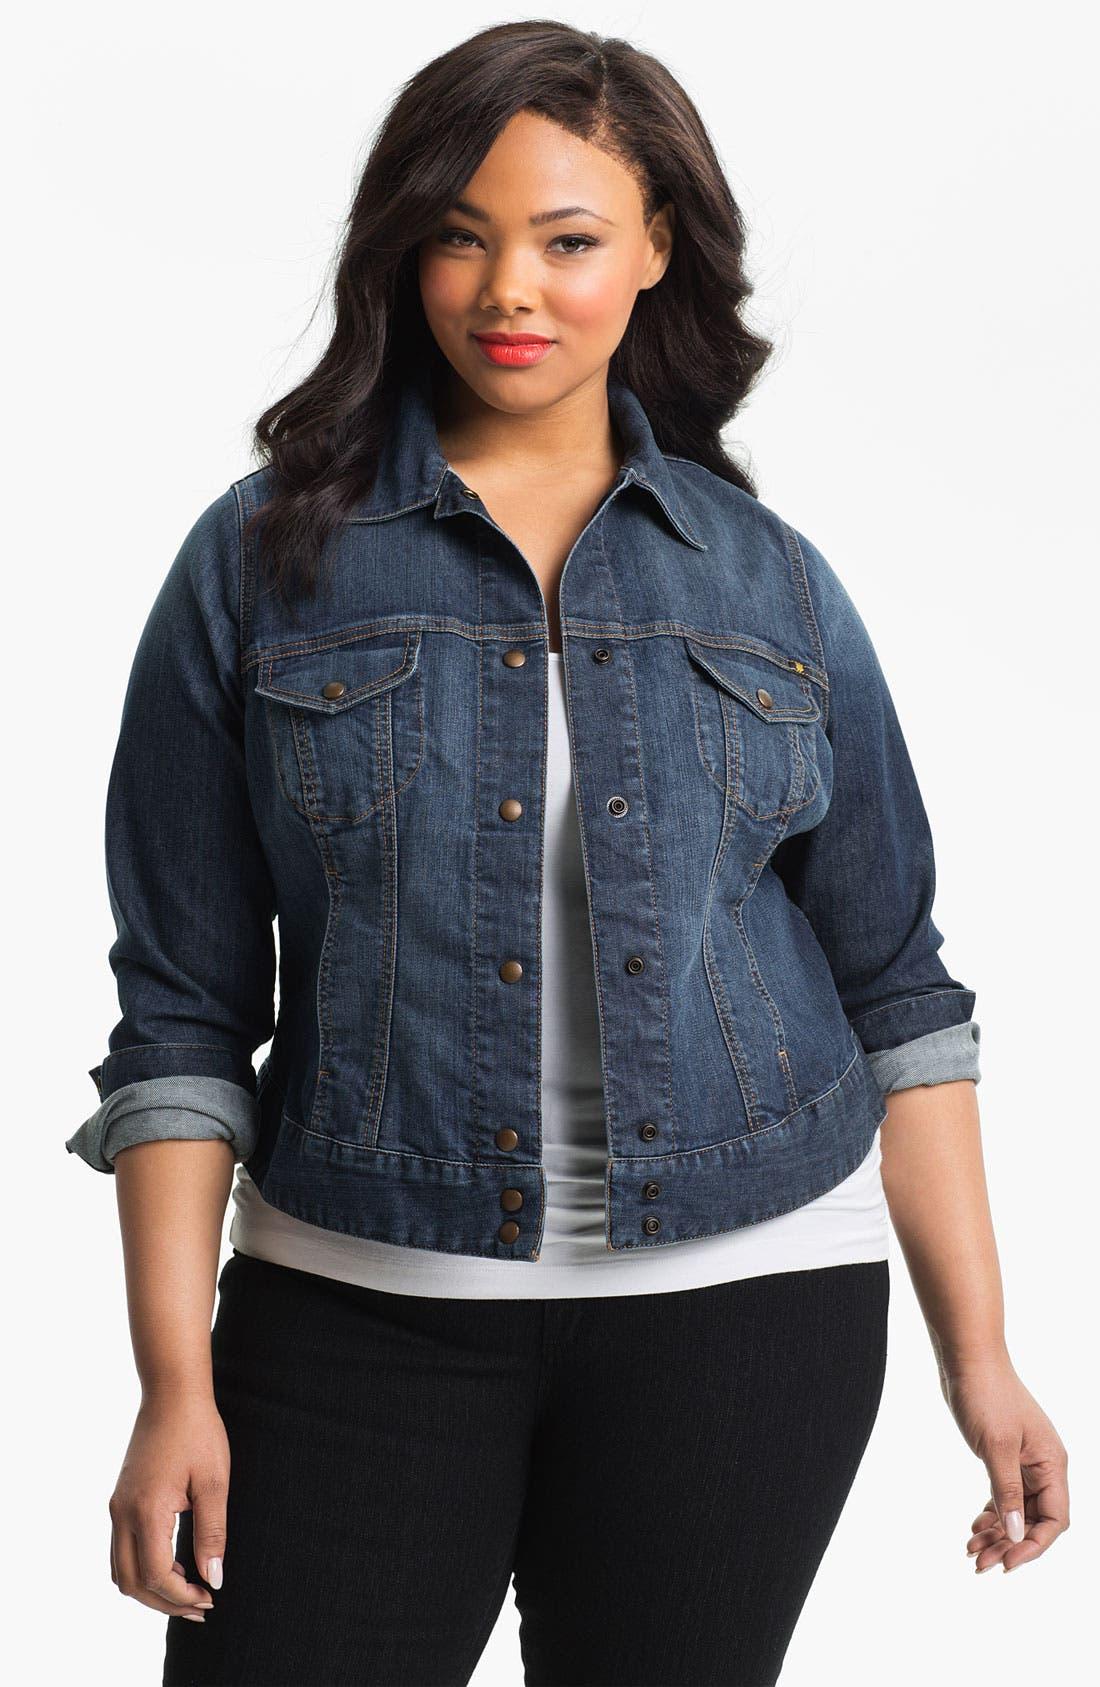 Alternate Image 1 Selected - Lucky Brand 'Adelaide' Denim Jacket (Plus Size)